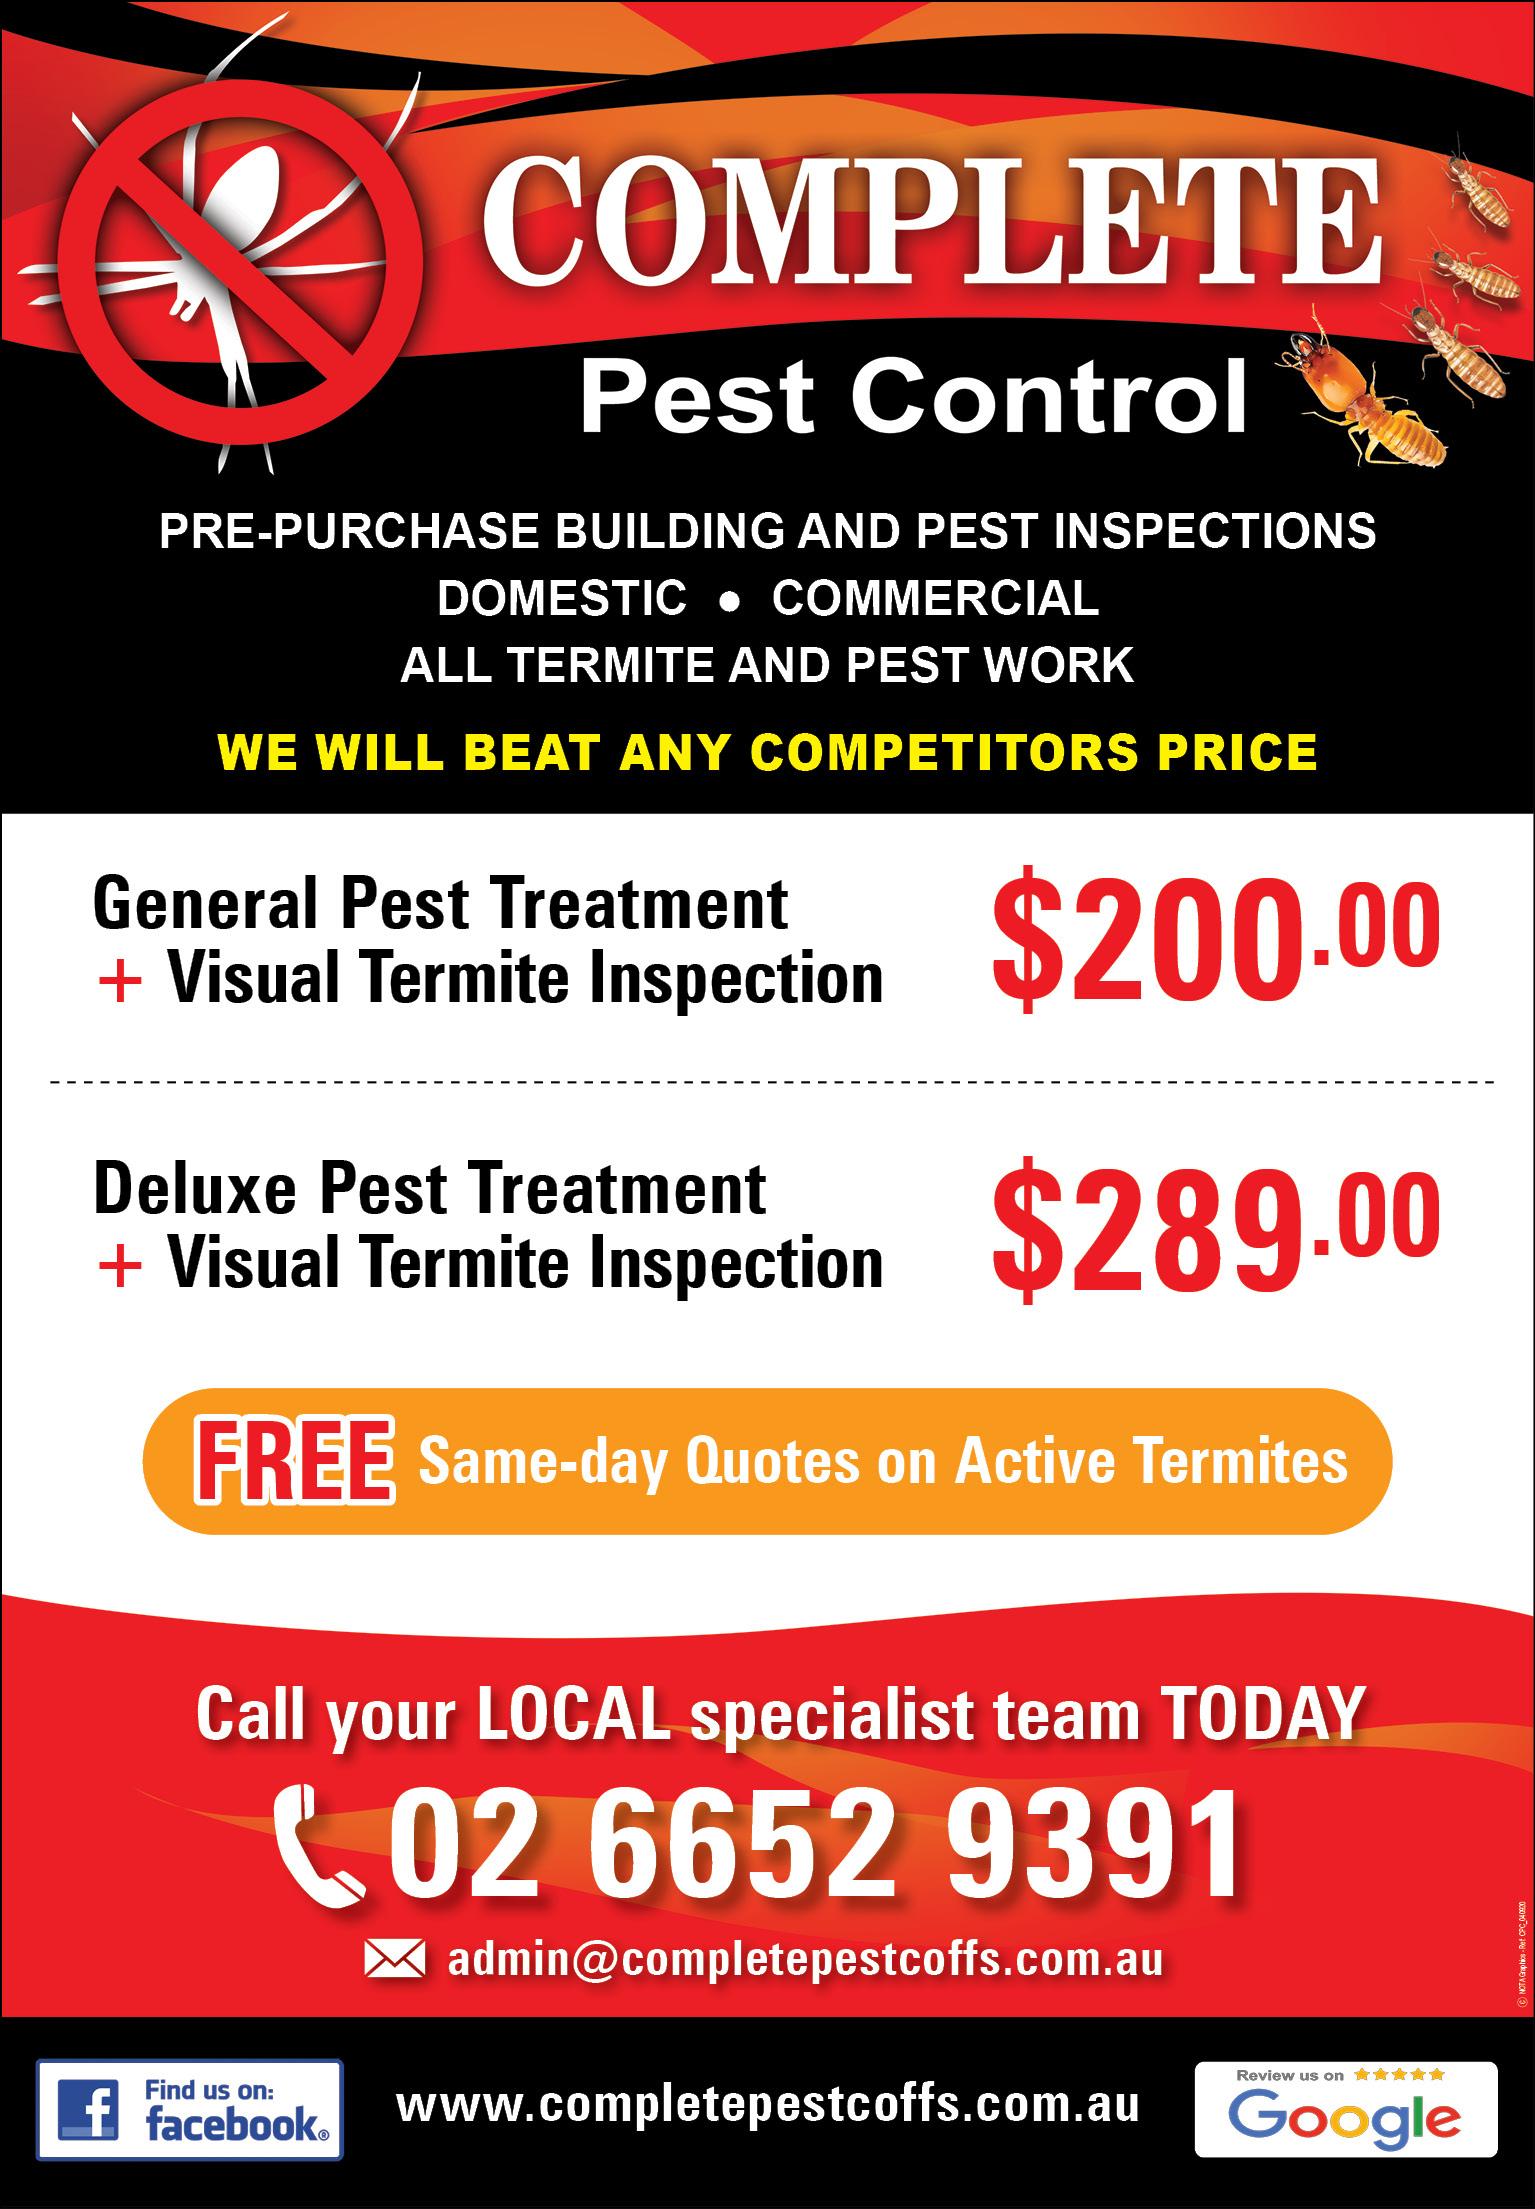 Complete Pest Control